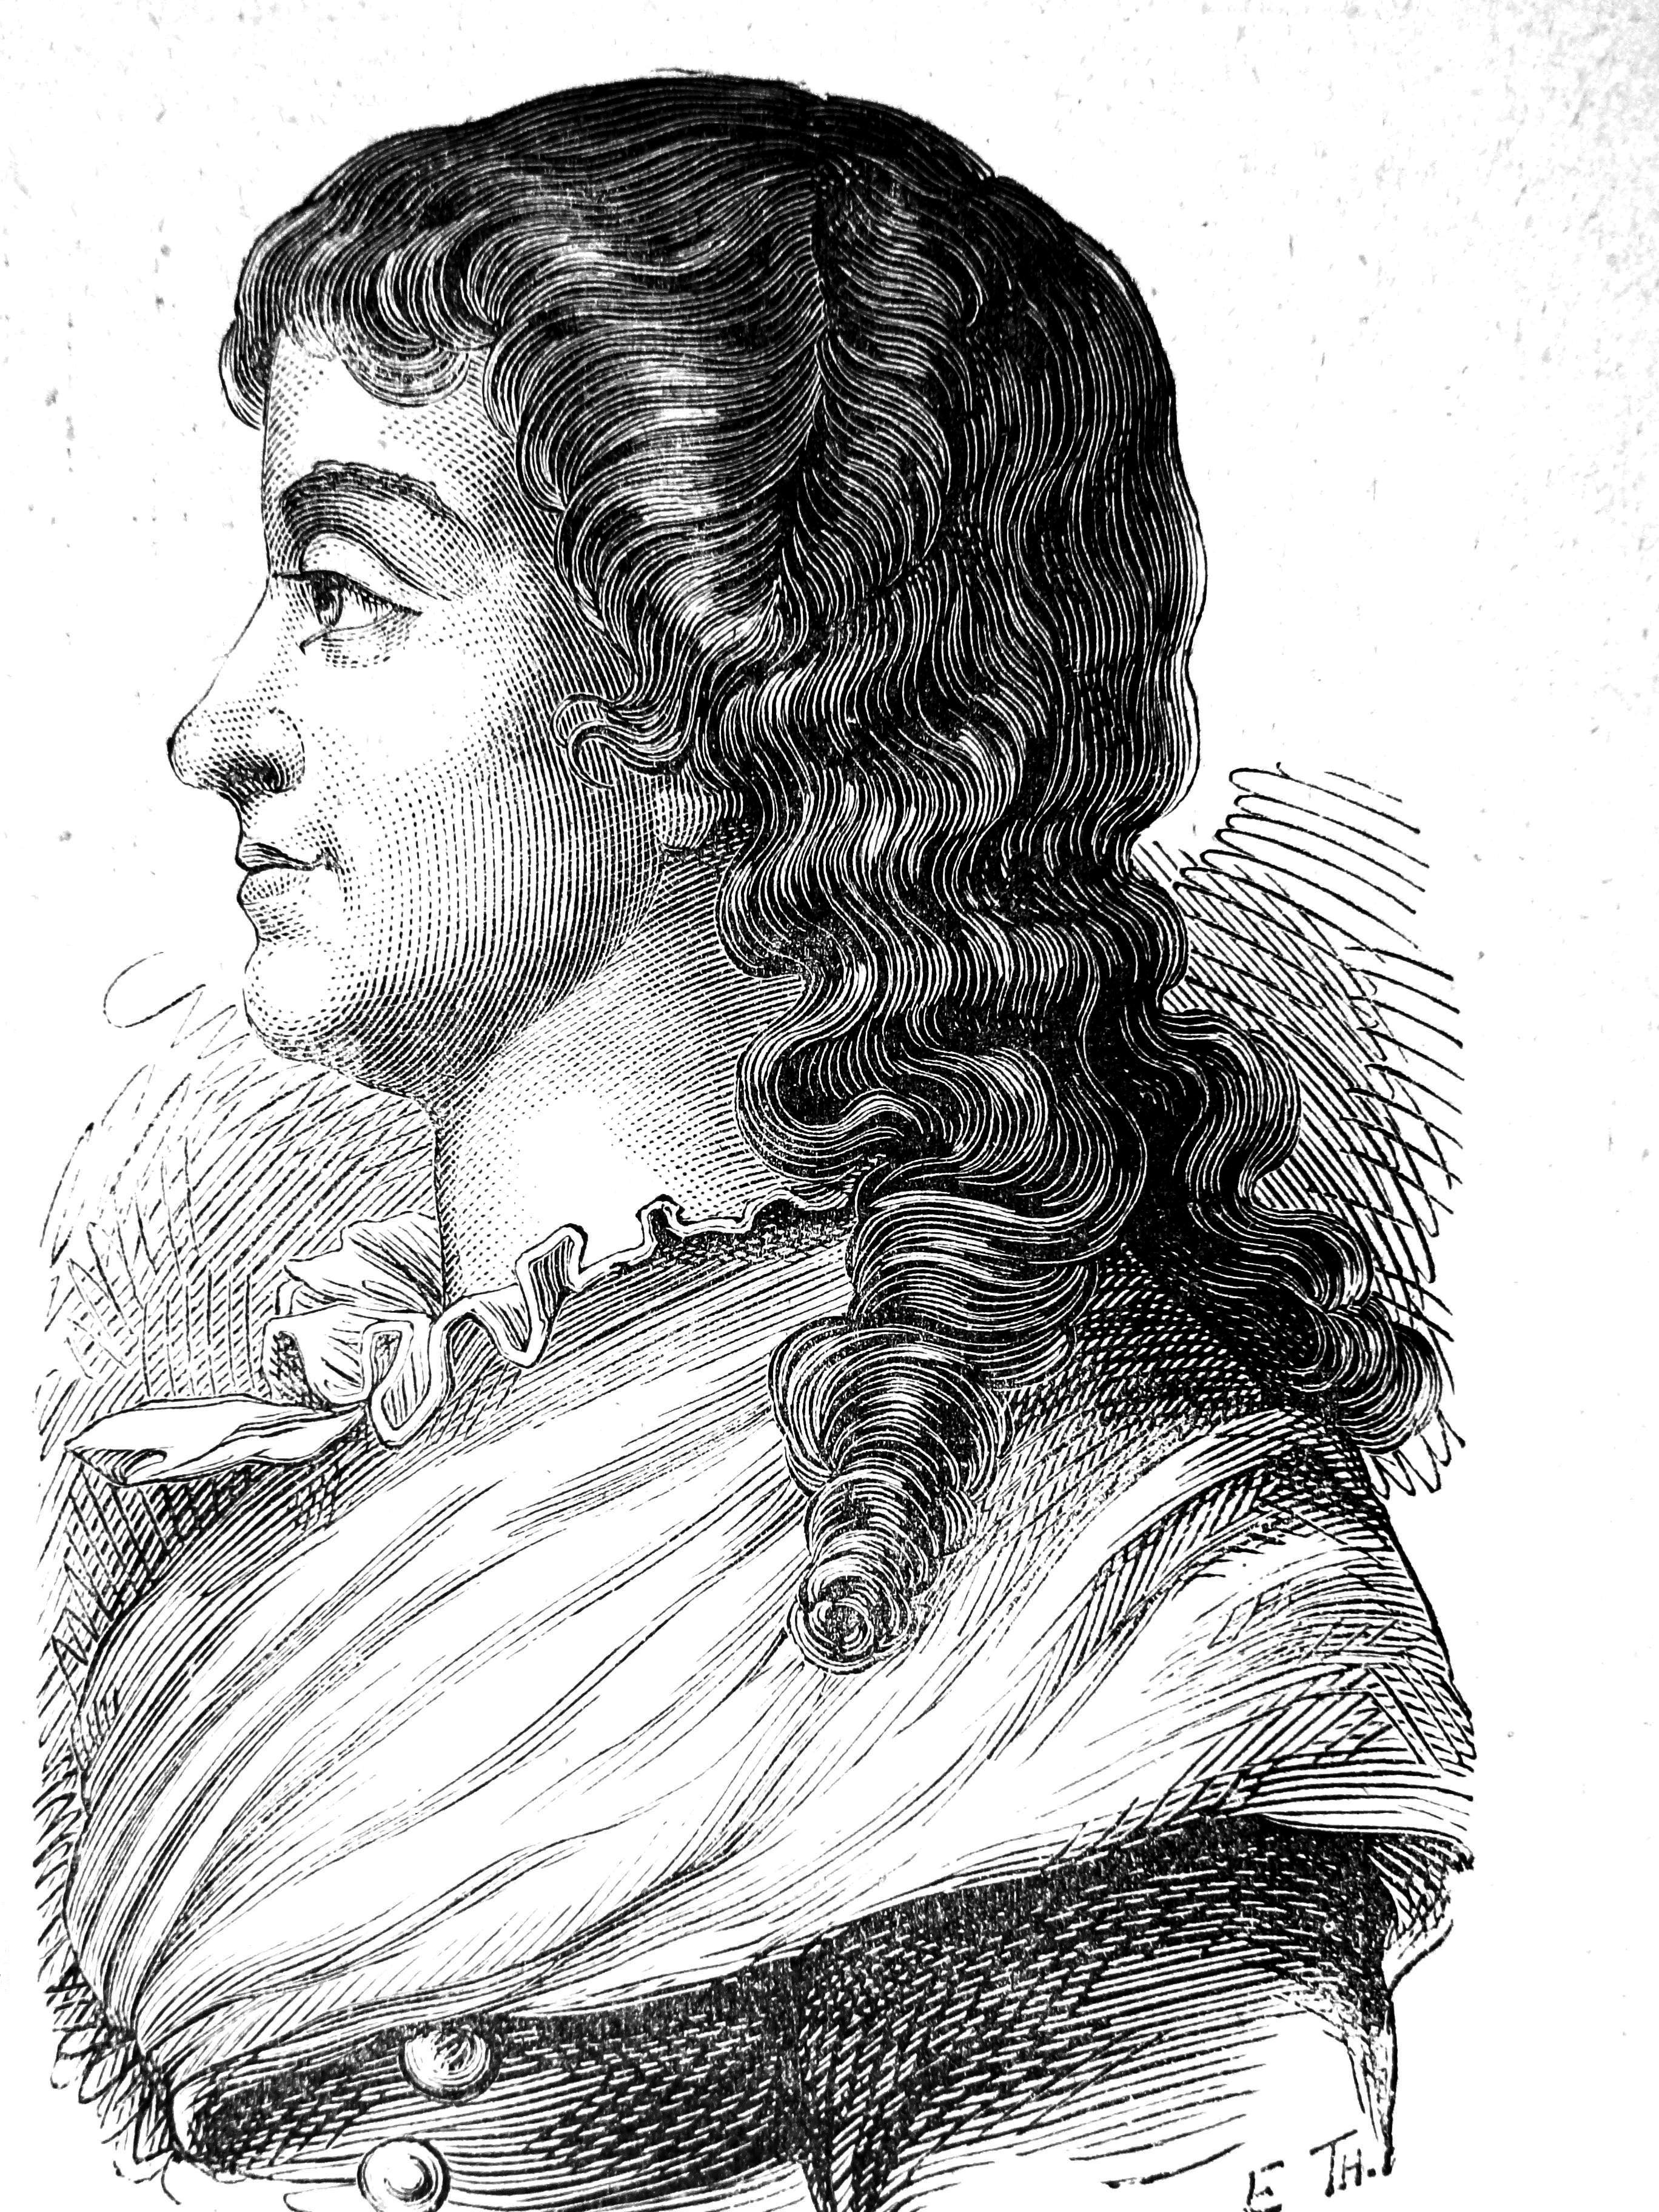 File:AduC 134 Madame roland (M,.J. Phlippon, 1754-1793 ...